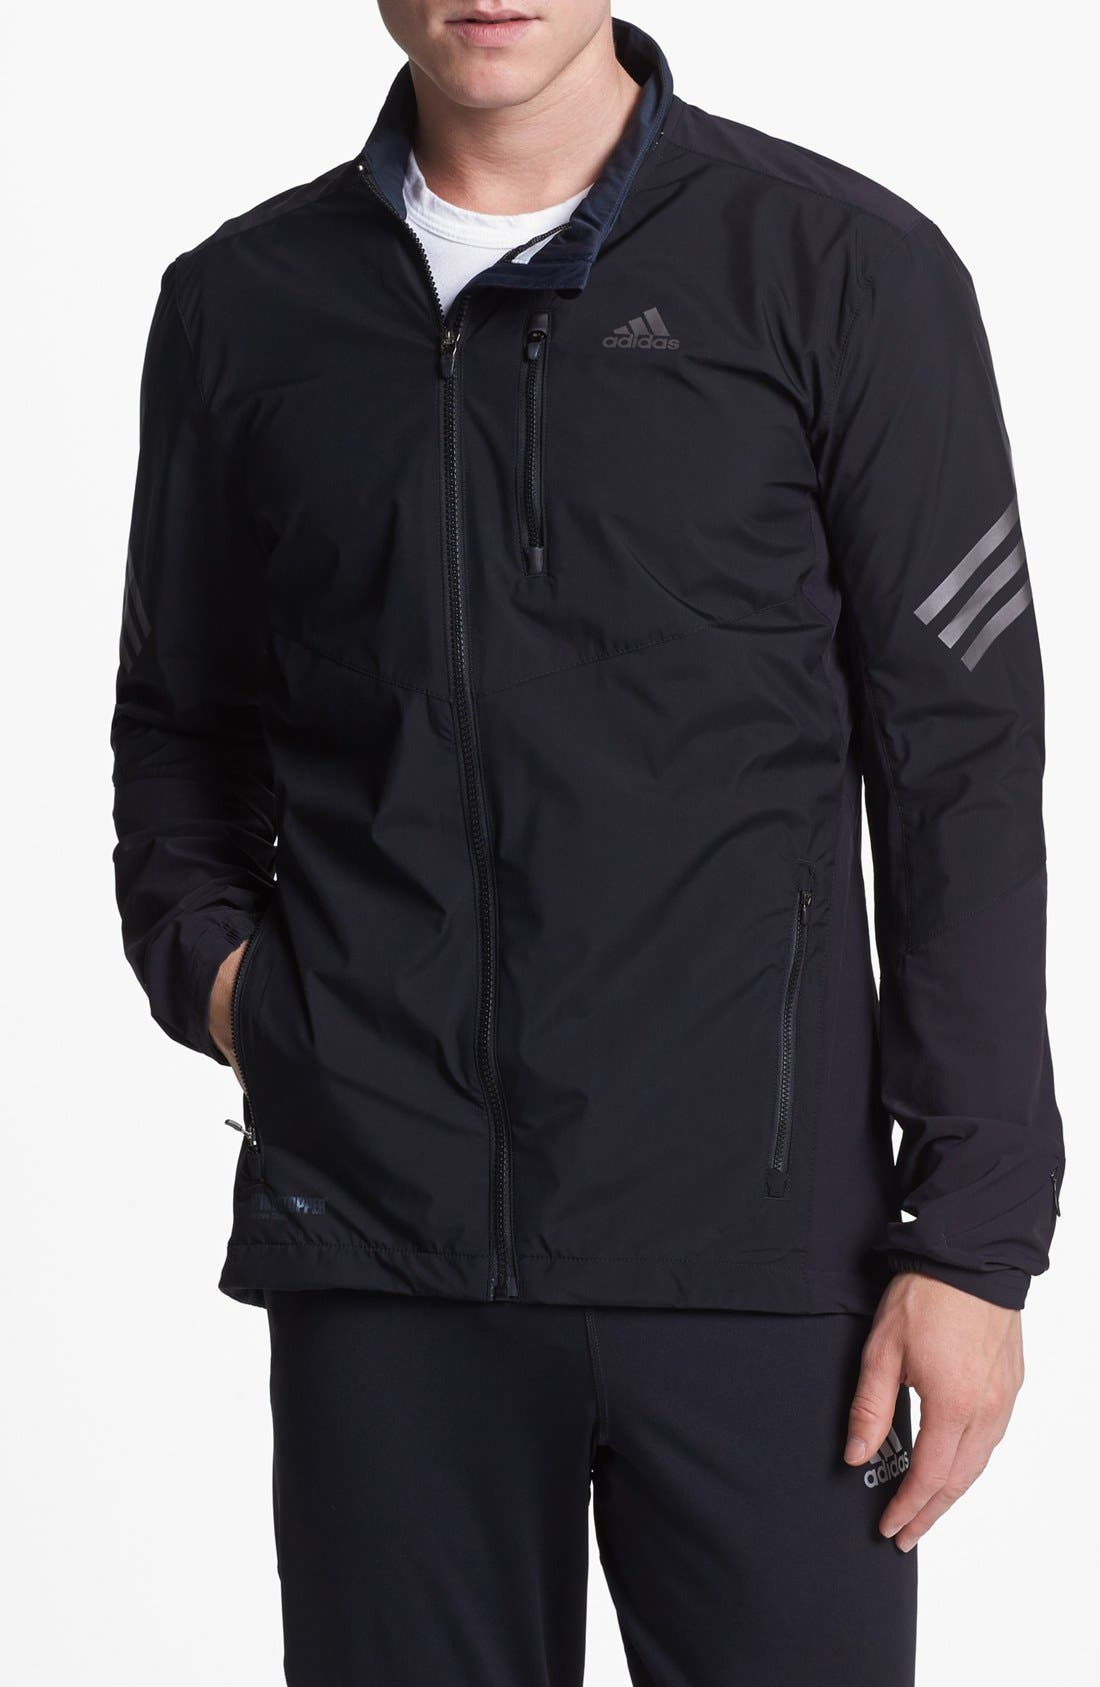 Alternate Image 1 Selected - adidas 'Supernova' Track Jacket